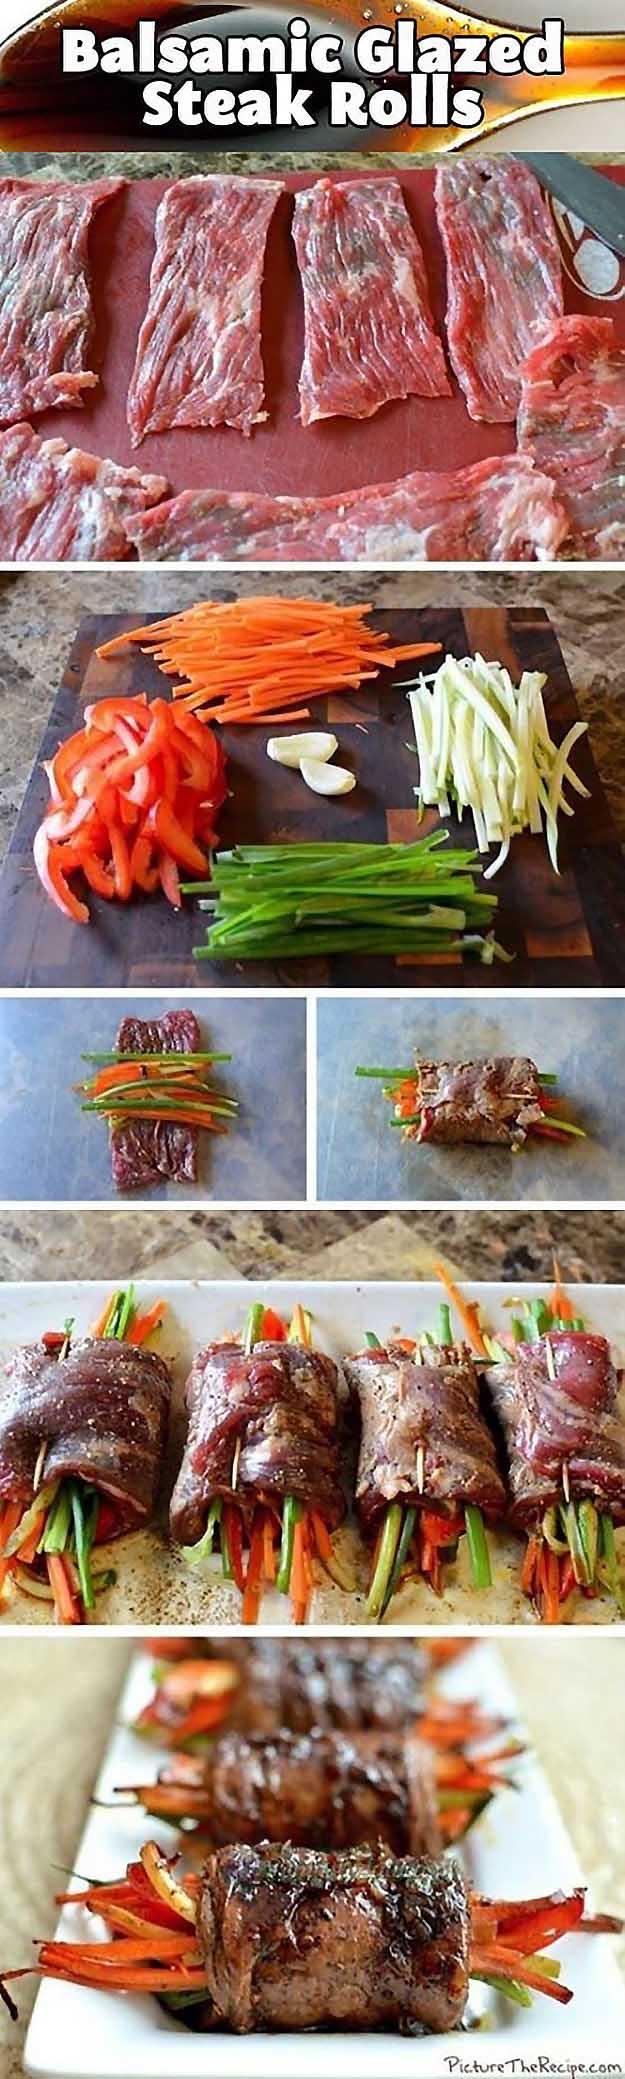 Best 4th of July Recipes and Backyard BBQ ideas - Balsamic Glazed Steak Rolls at